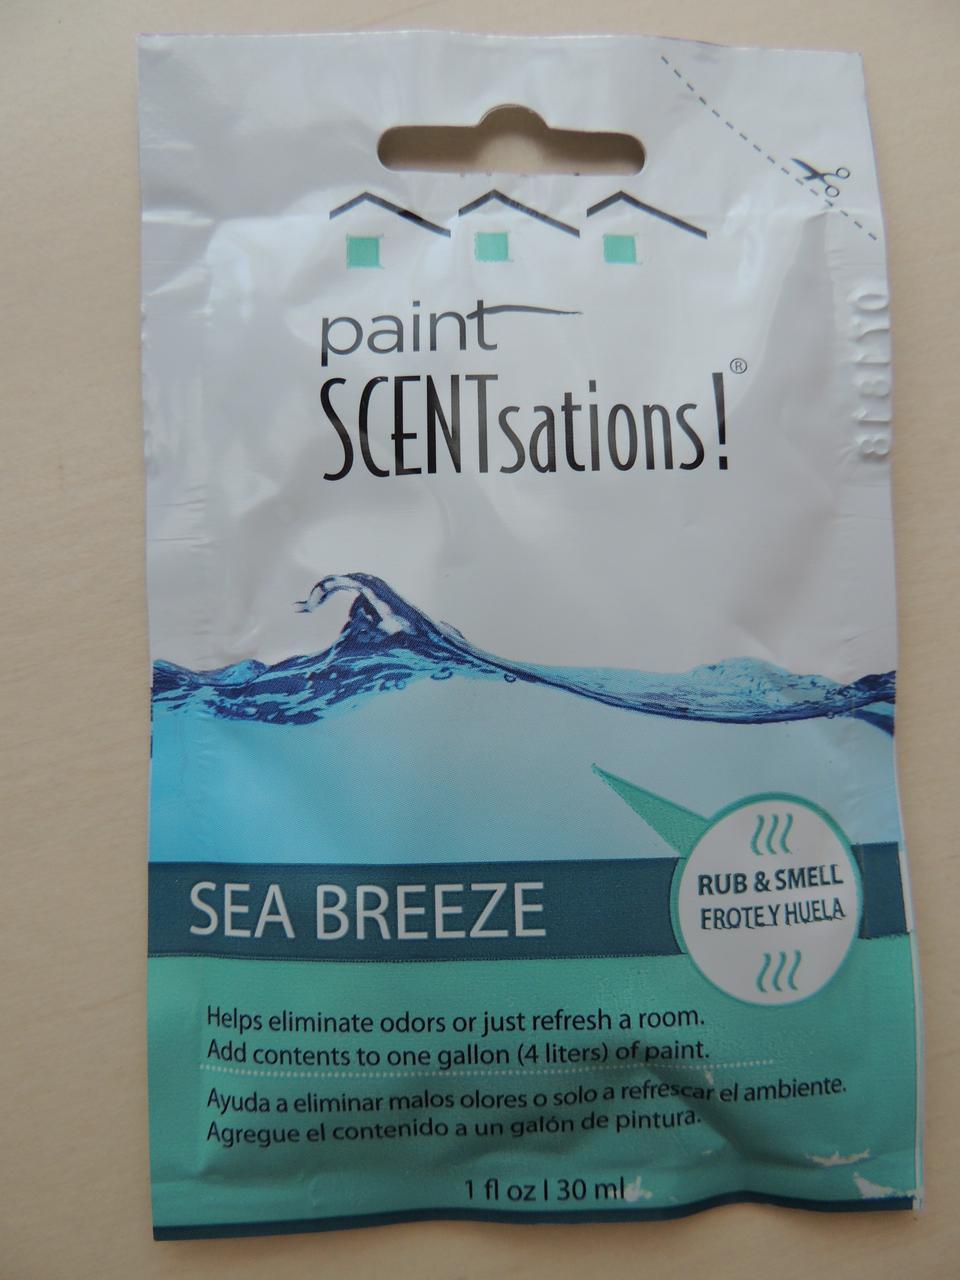 Paint SCENTsations ароматизована добавка до фарби Sea Breeze (Морський бриз)